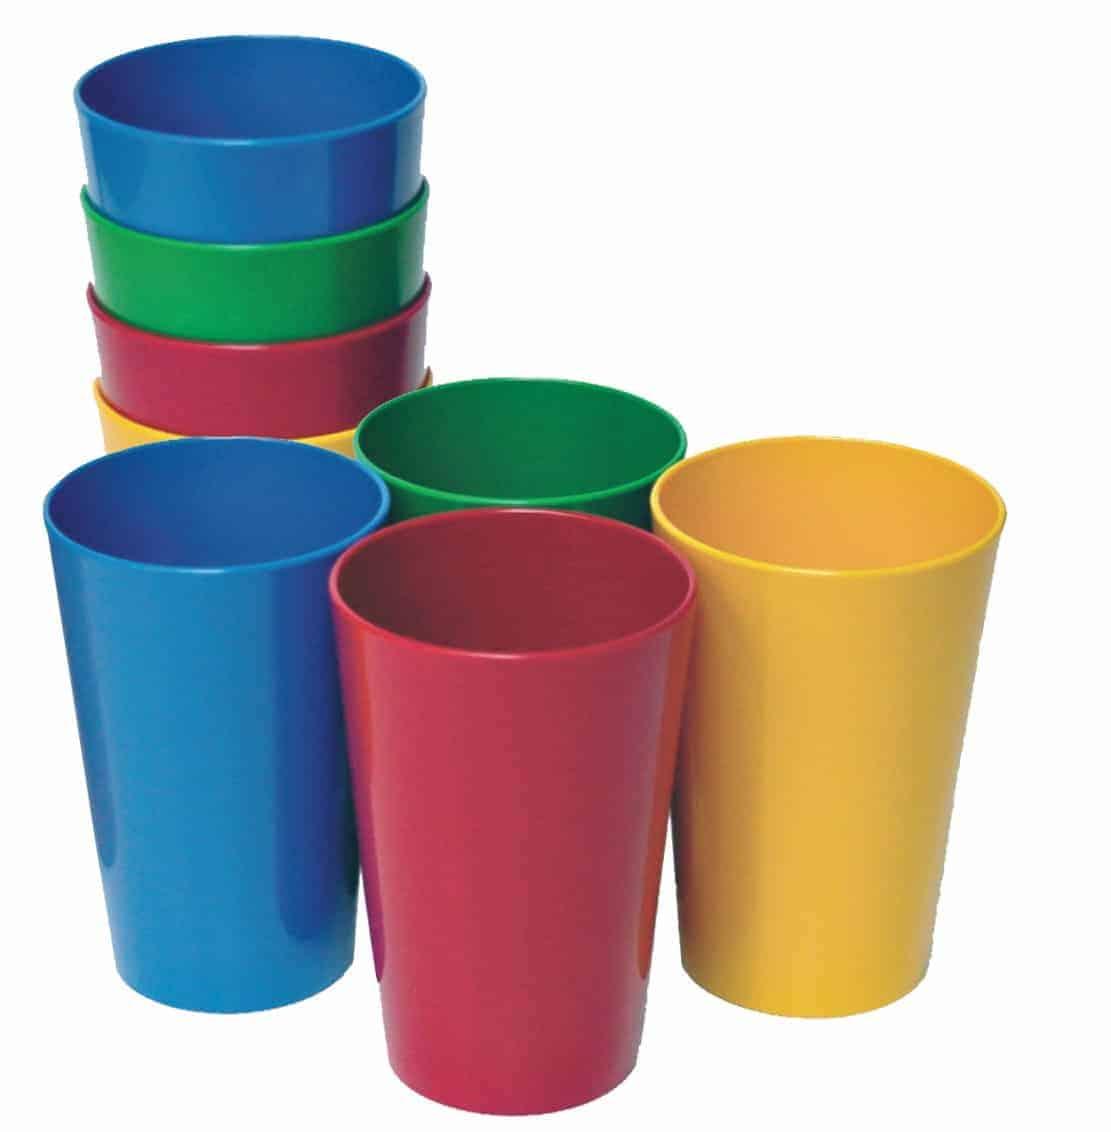 Surtido Vasos De Colores 8 Unidades Infantil